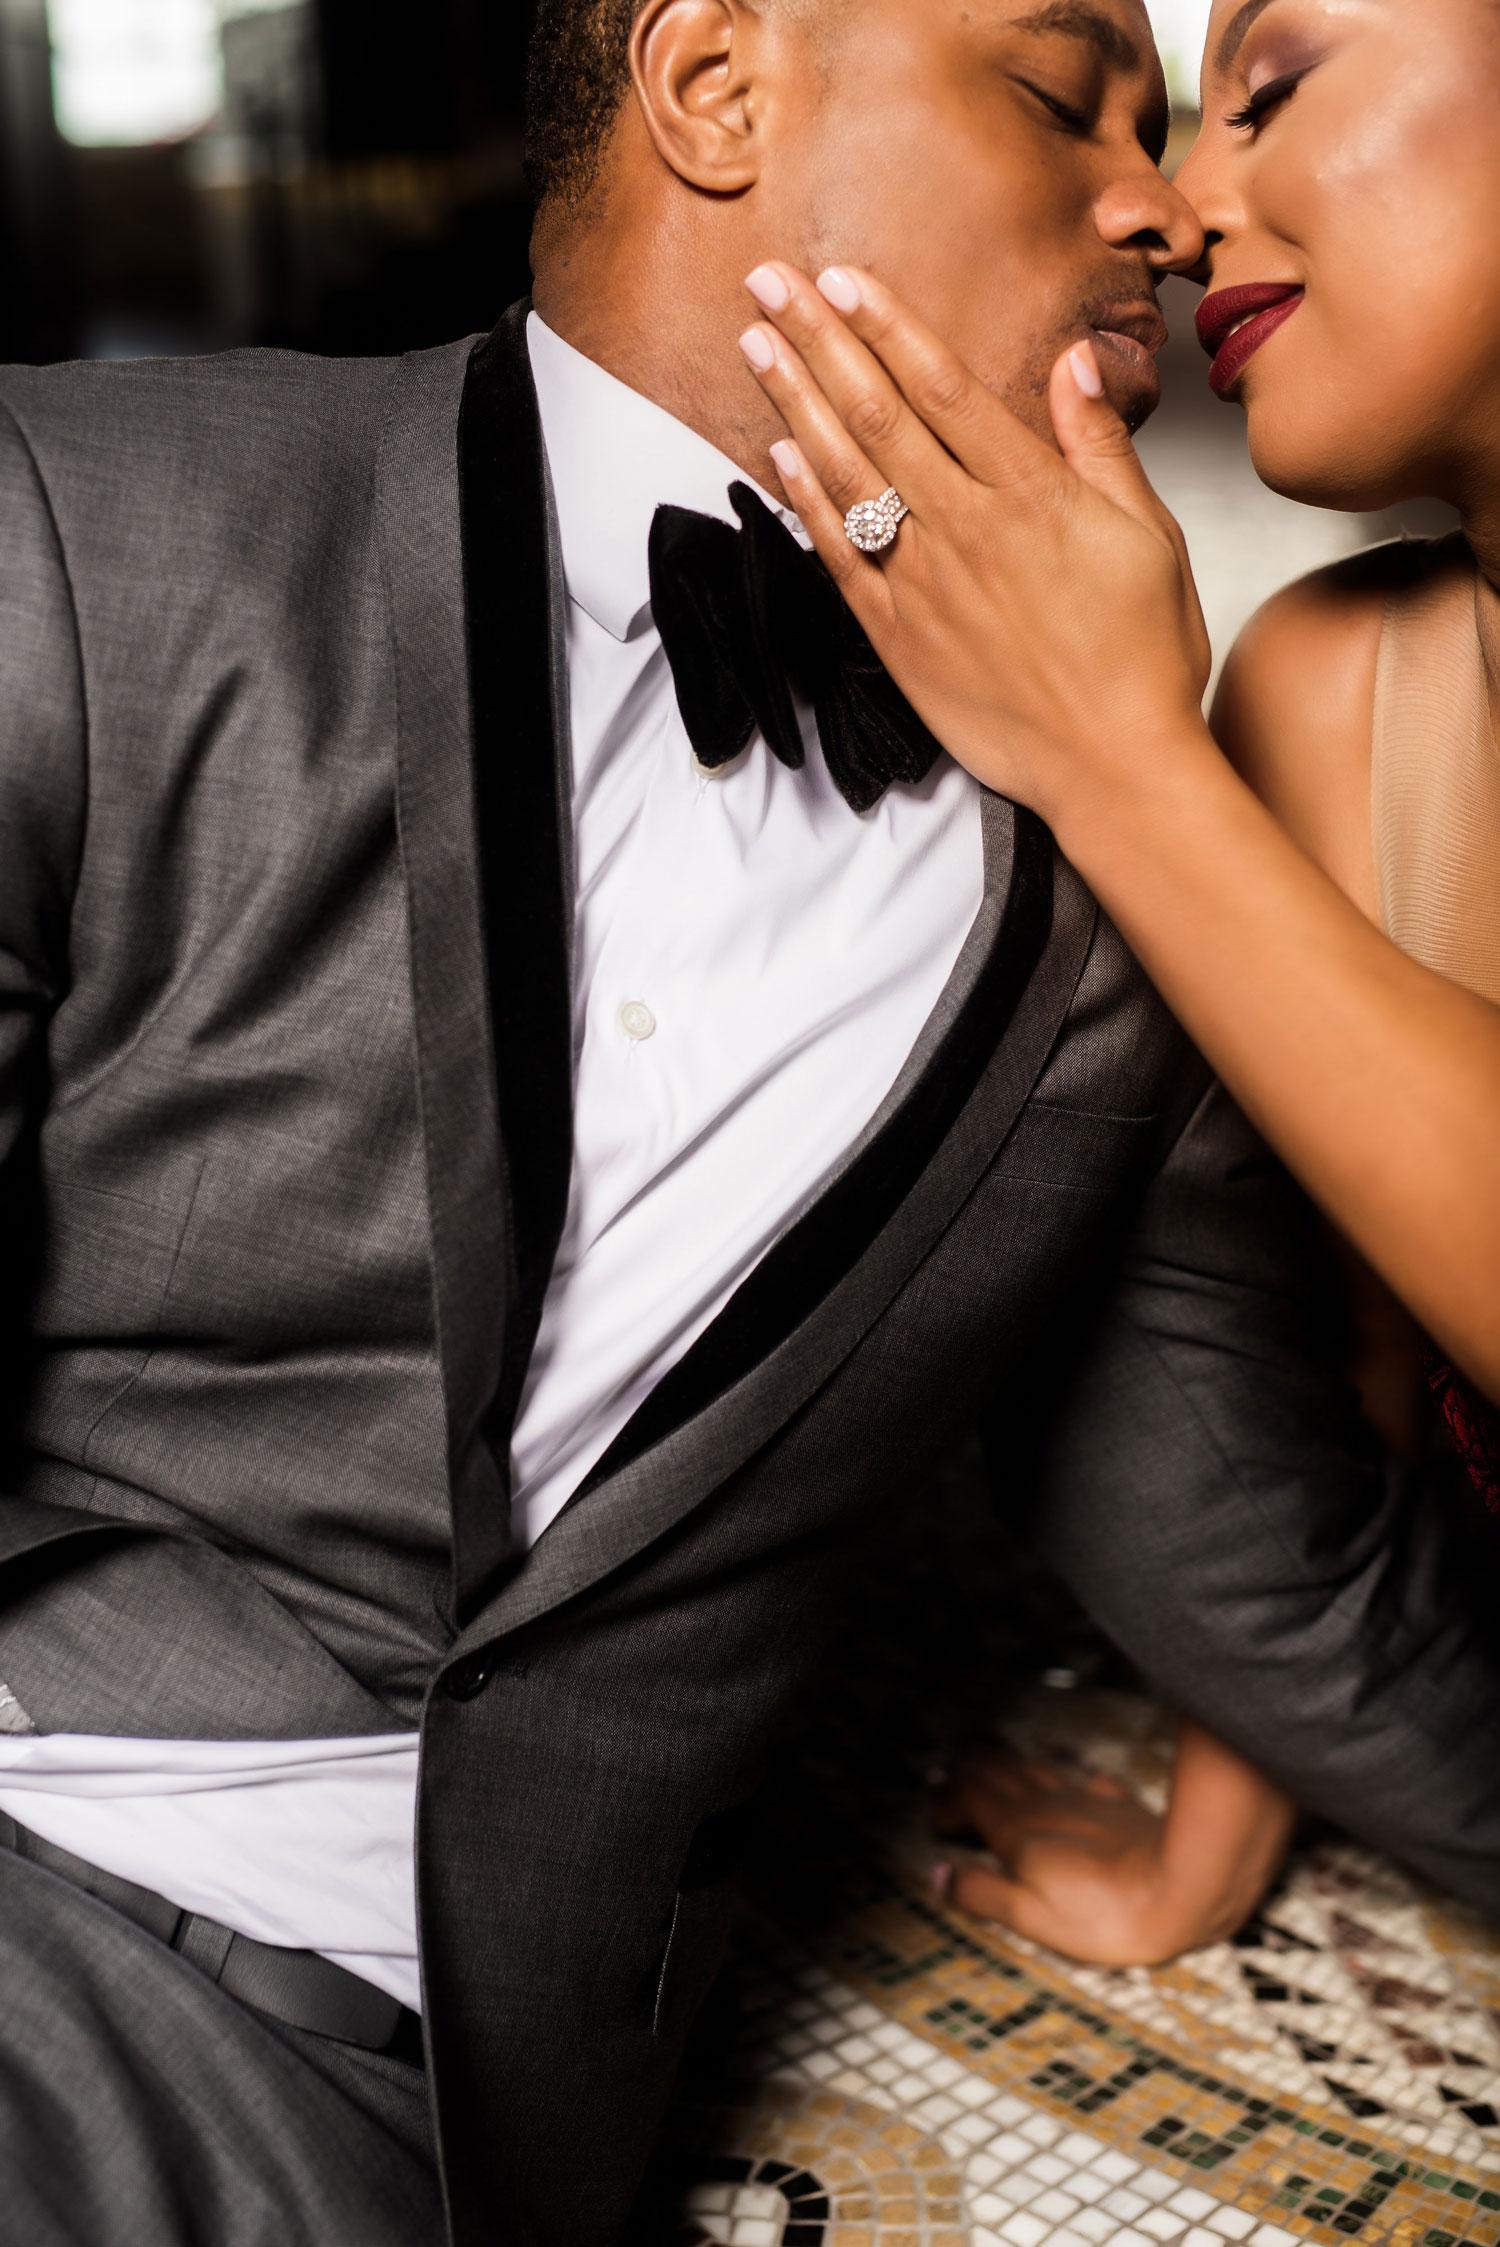 Kacey Angulo and Tony Sipp Houston Astros baseball player wedding engagement photo shoot session engagement ring